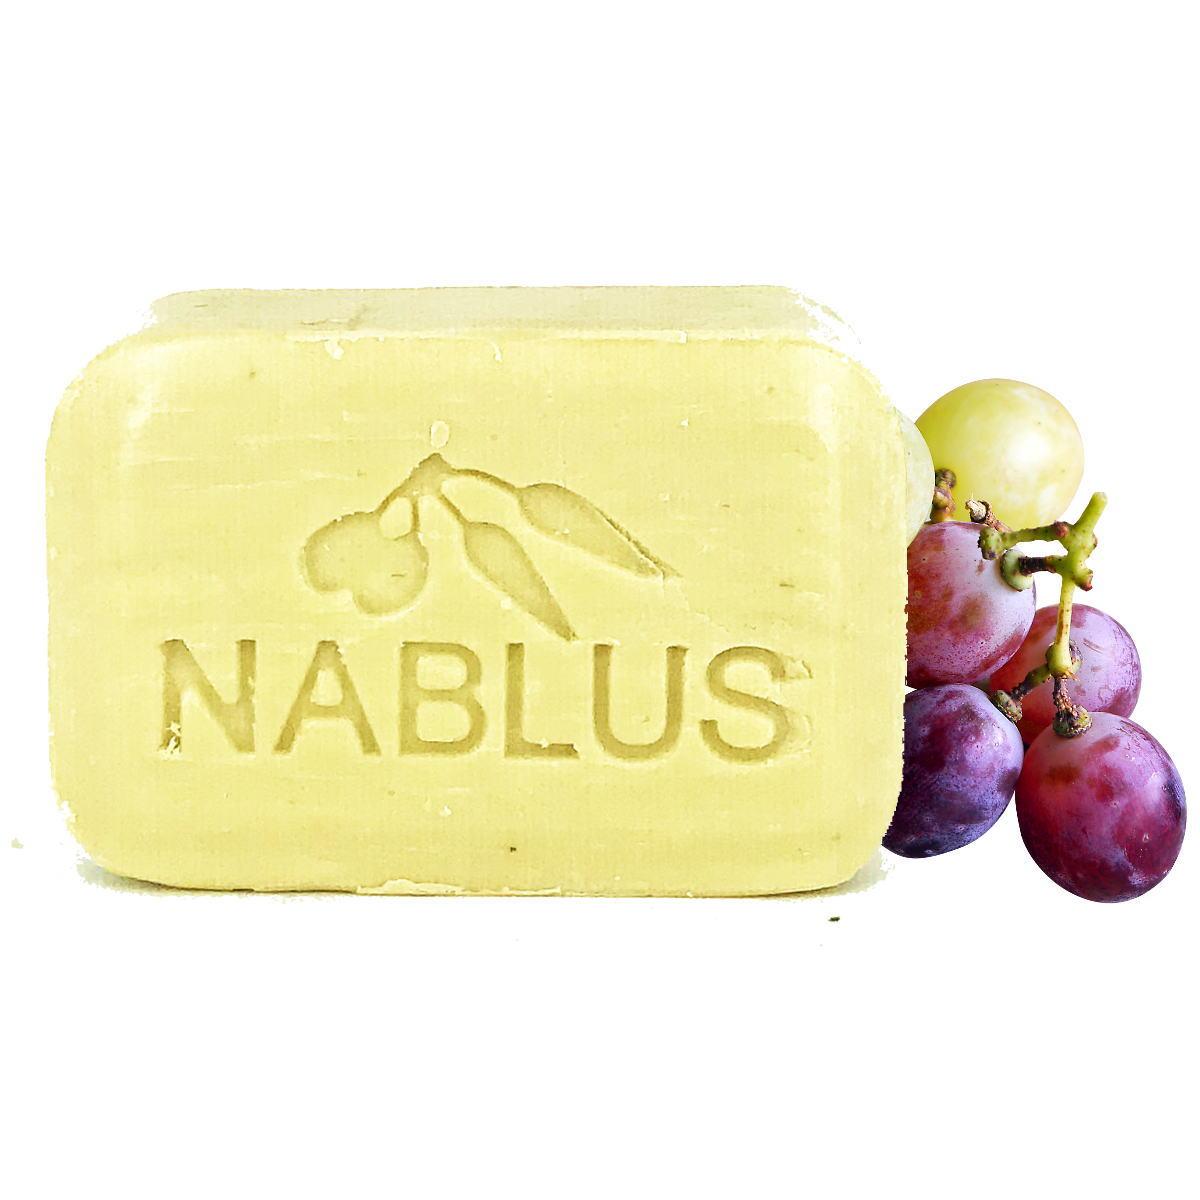 Nablus Soap ナーブルスソープ - ぶどう - 無添加 オーガニック石鹸